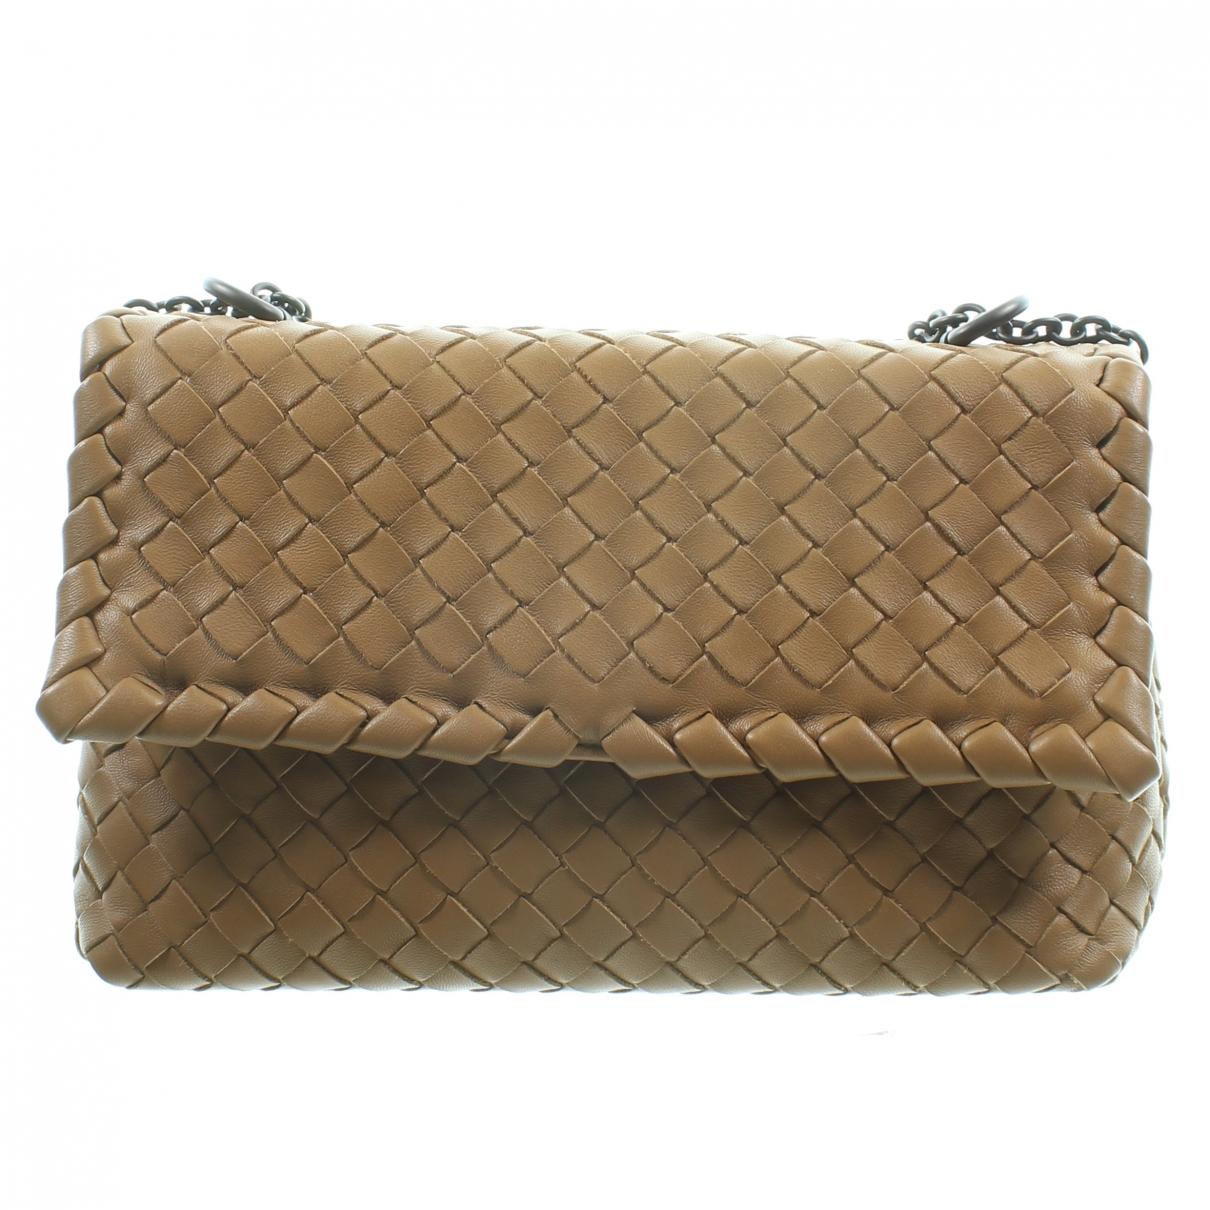 Bottega Veneta Olimpia Brown Leather handbag for Women \N